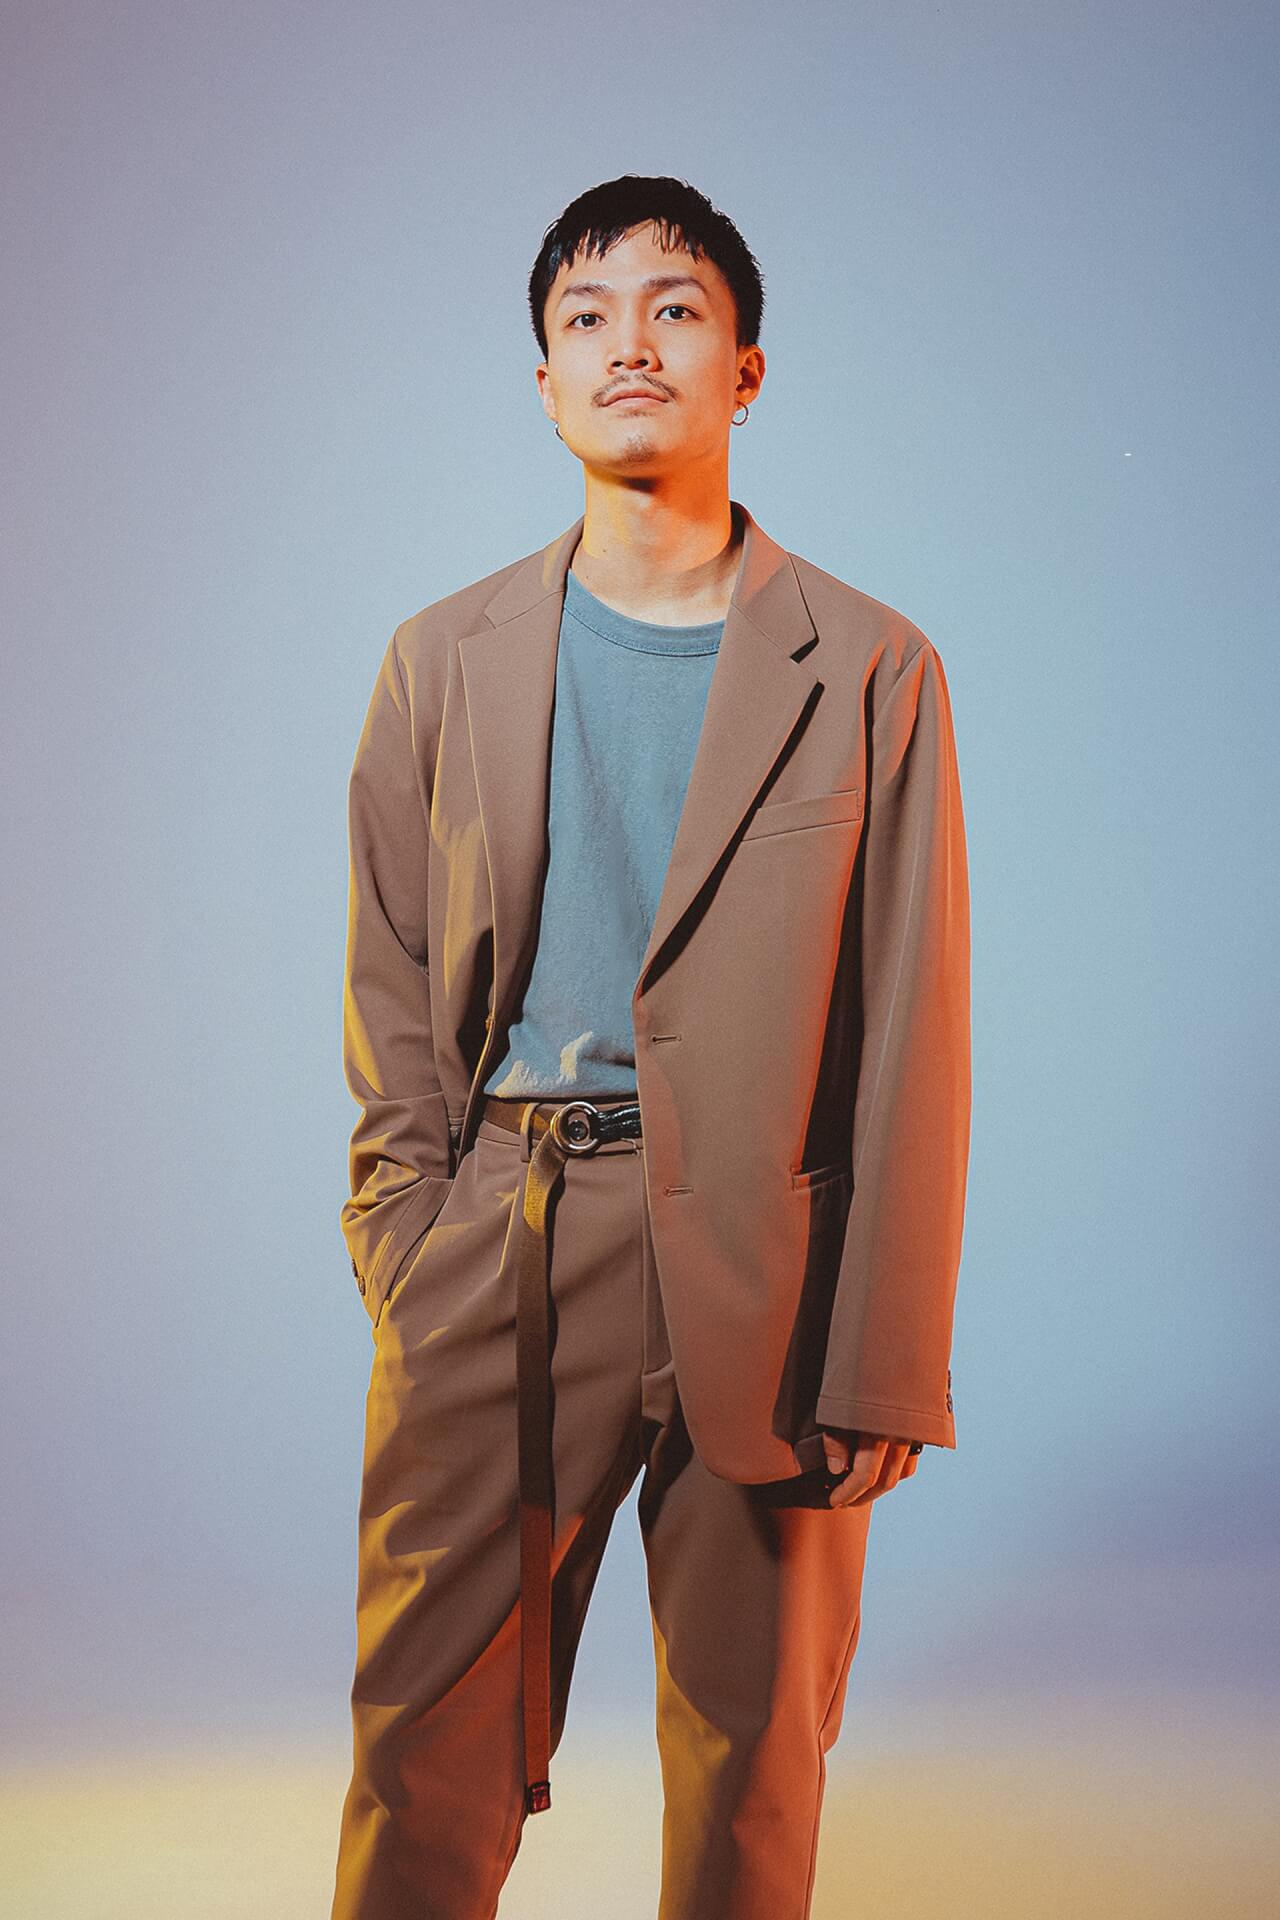 "Shin SakiuraがKANDYTOWNのRyohuを迎えた""More Life""の7インチをリリース!リミックスverもデジタル配信開始 music200701_shinsakiura_ryohu_01"